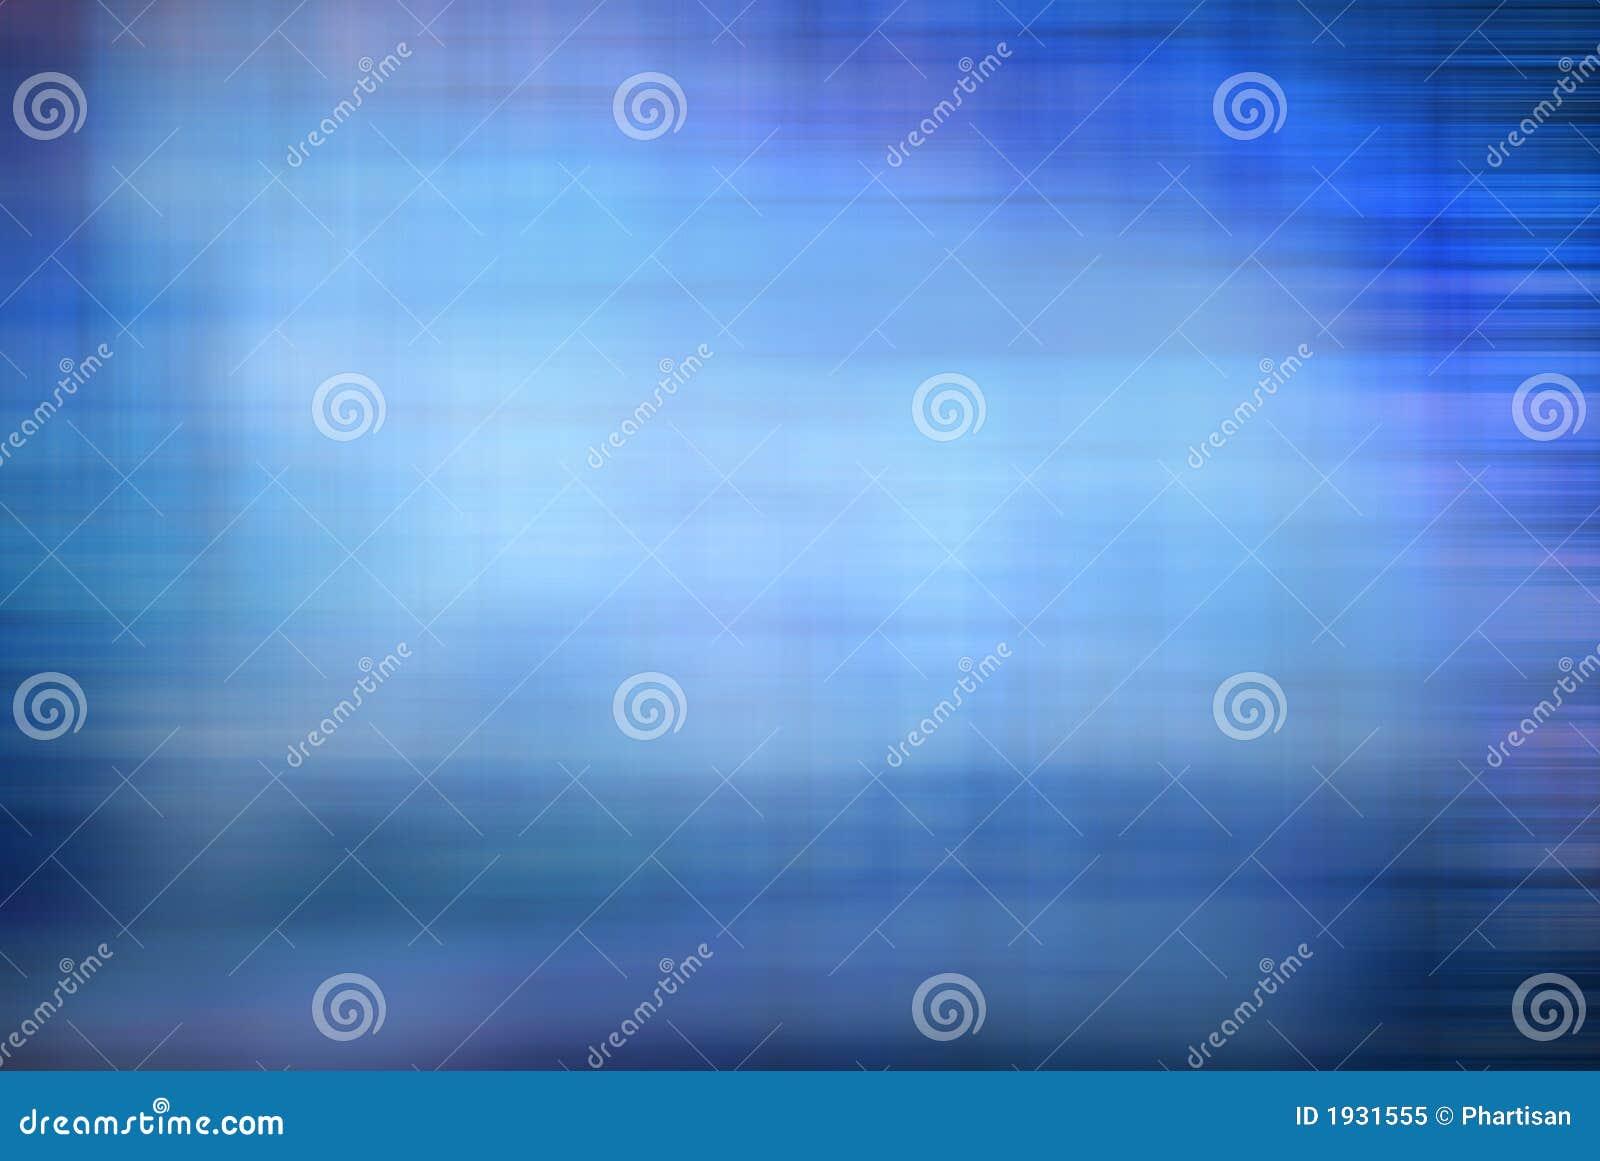 Fond posé multi bleu et blanc